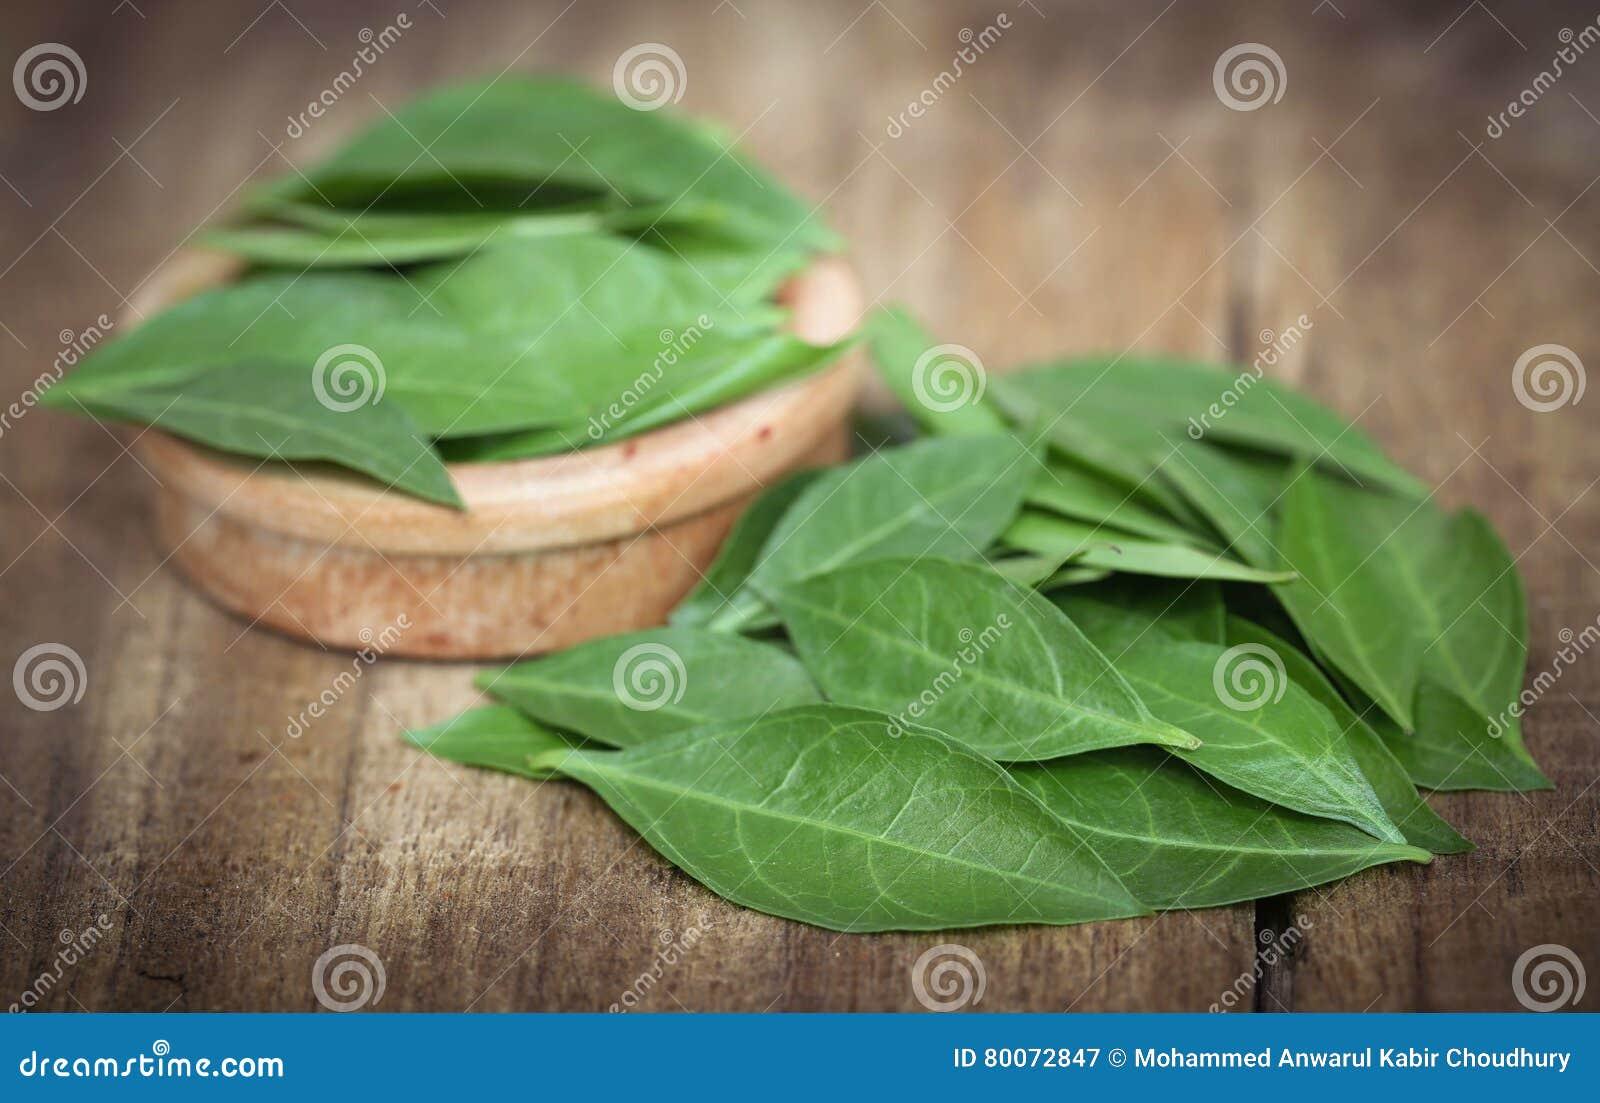 Ayurvedic henna leaves